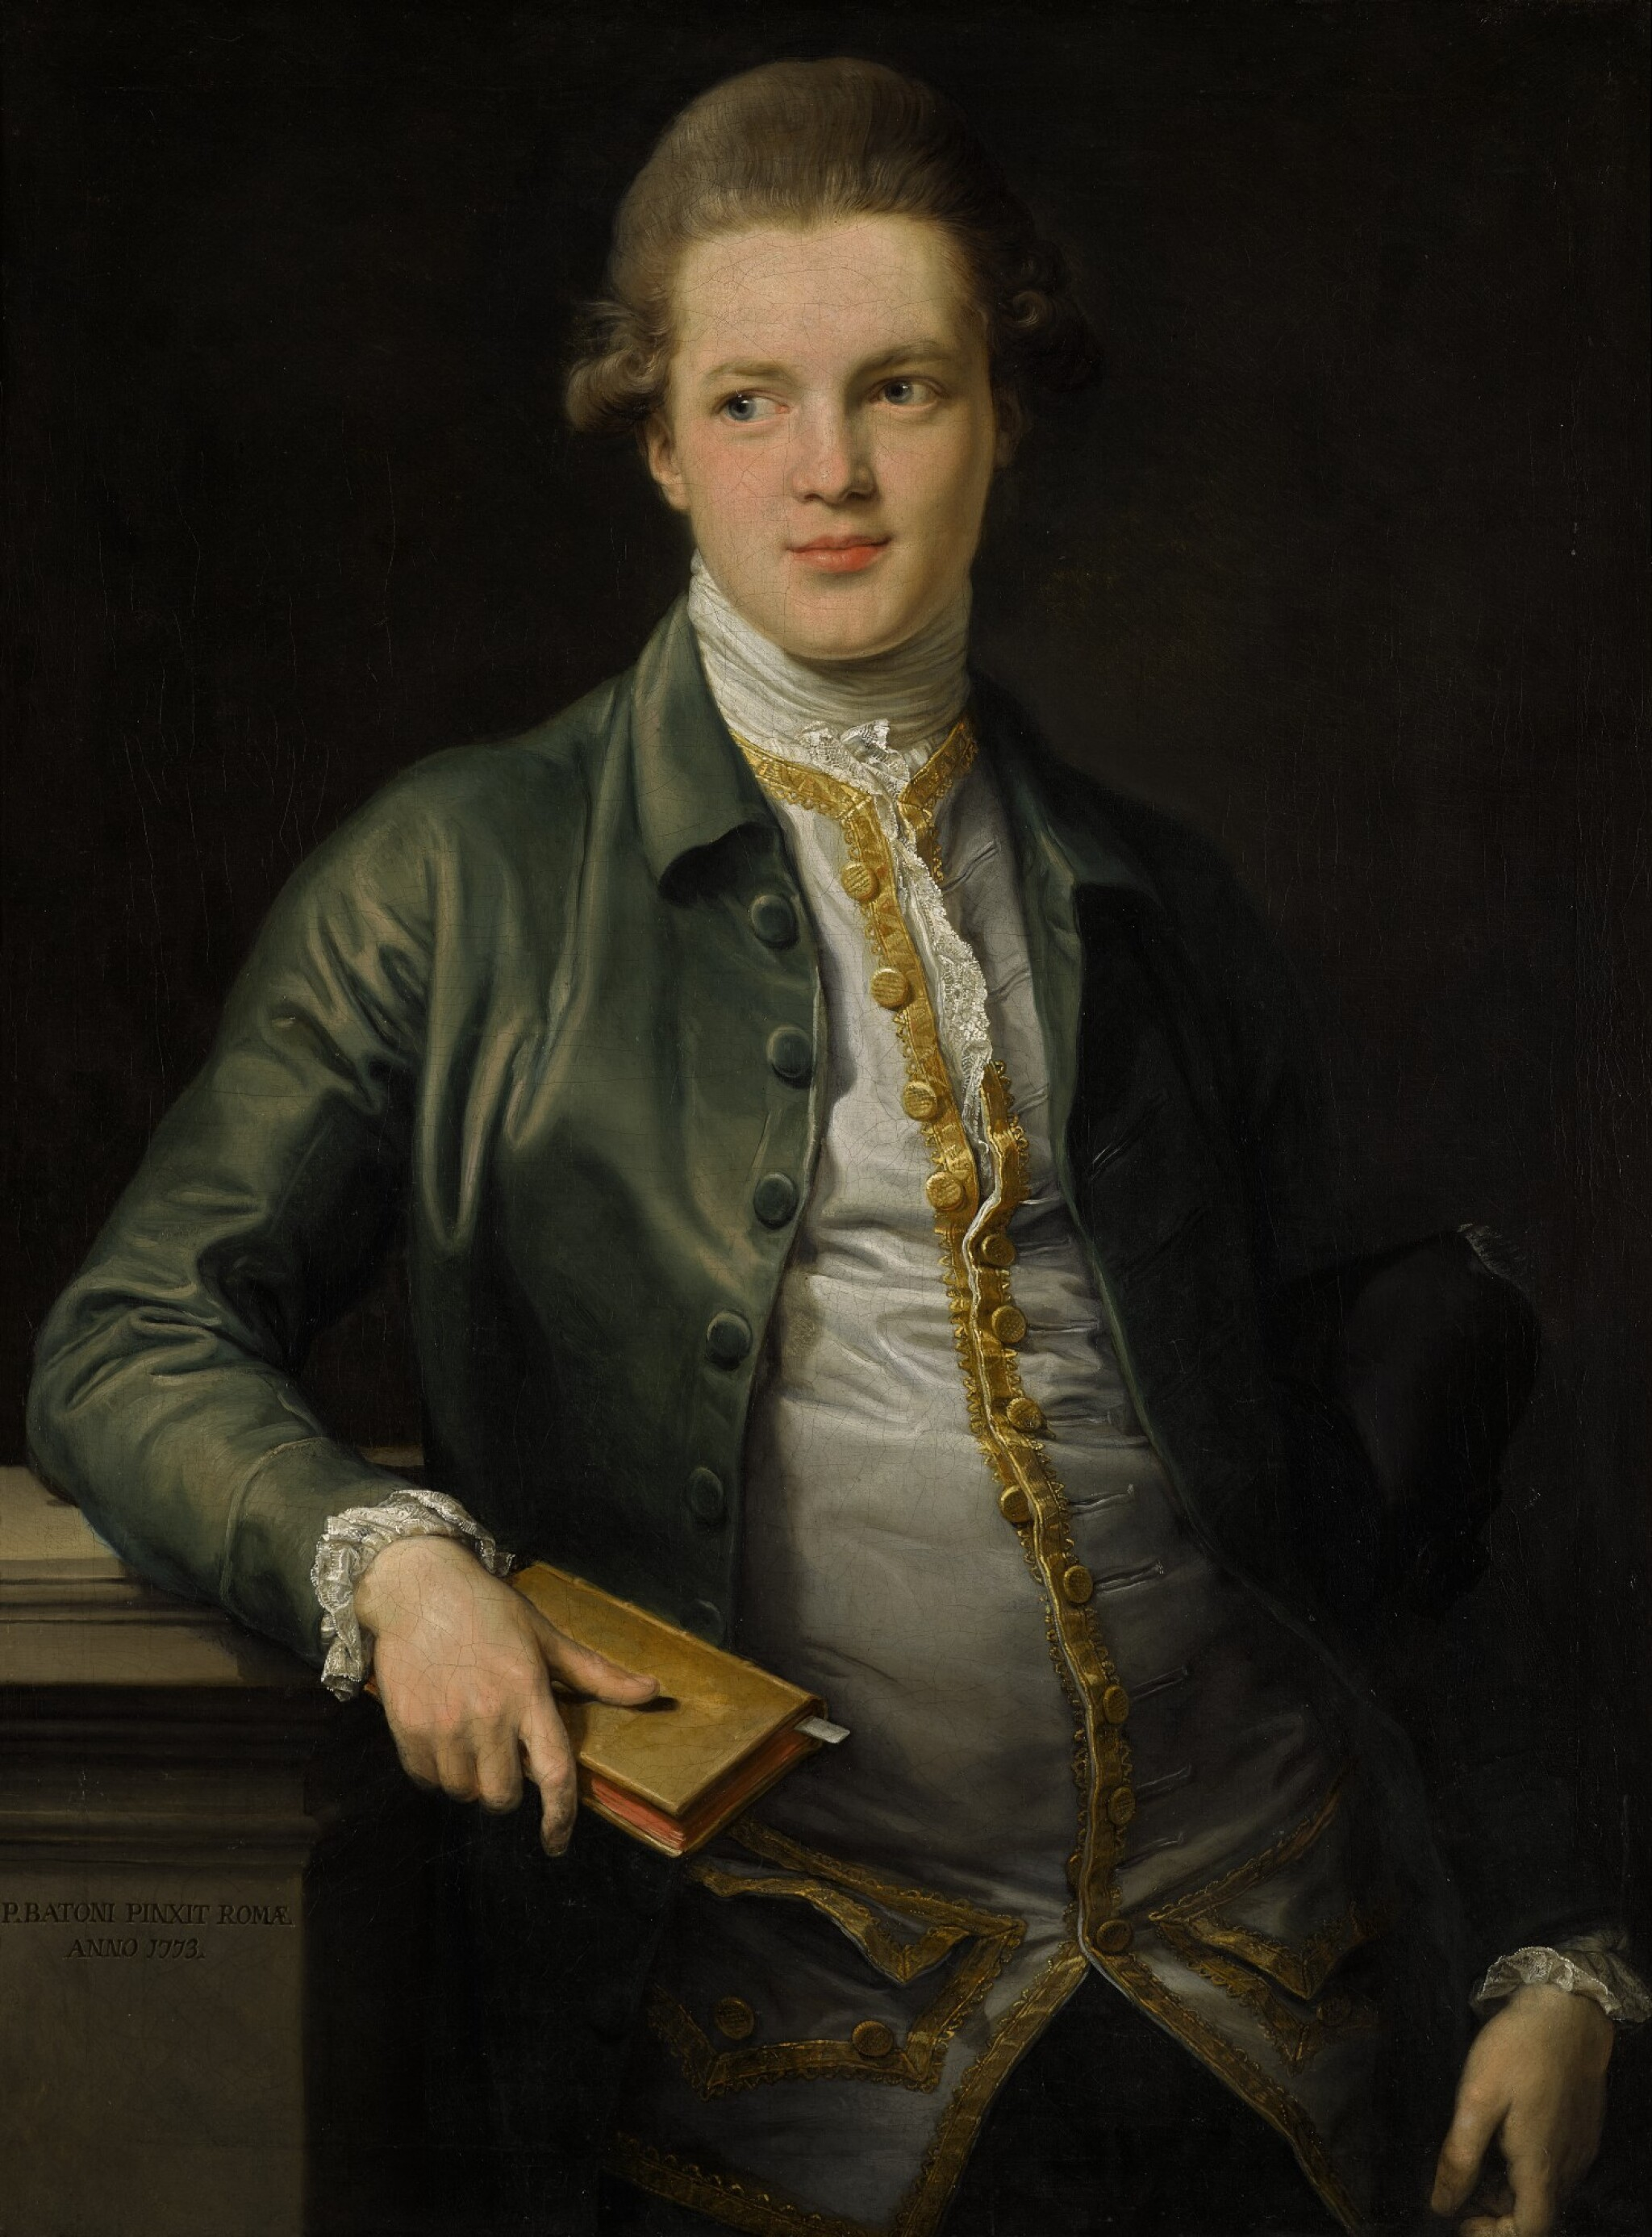 View full screen - View 1 of Lot 28. Portrait of Thomas Orde, later Orde-Powlett and 1st Baron Bolton (1746–1807) |《托馬斯・奧德(1746-1807年)肖像,後封奧德・寶勒及保頓男爵一世》.